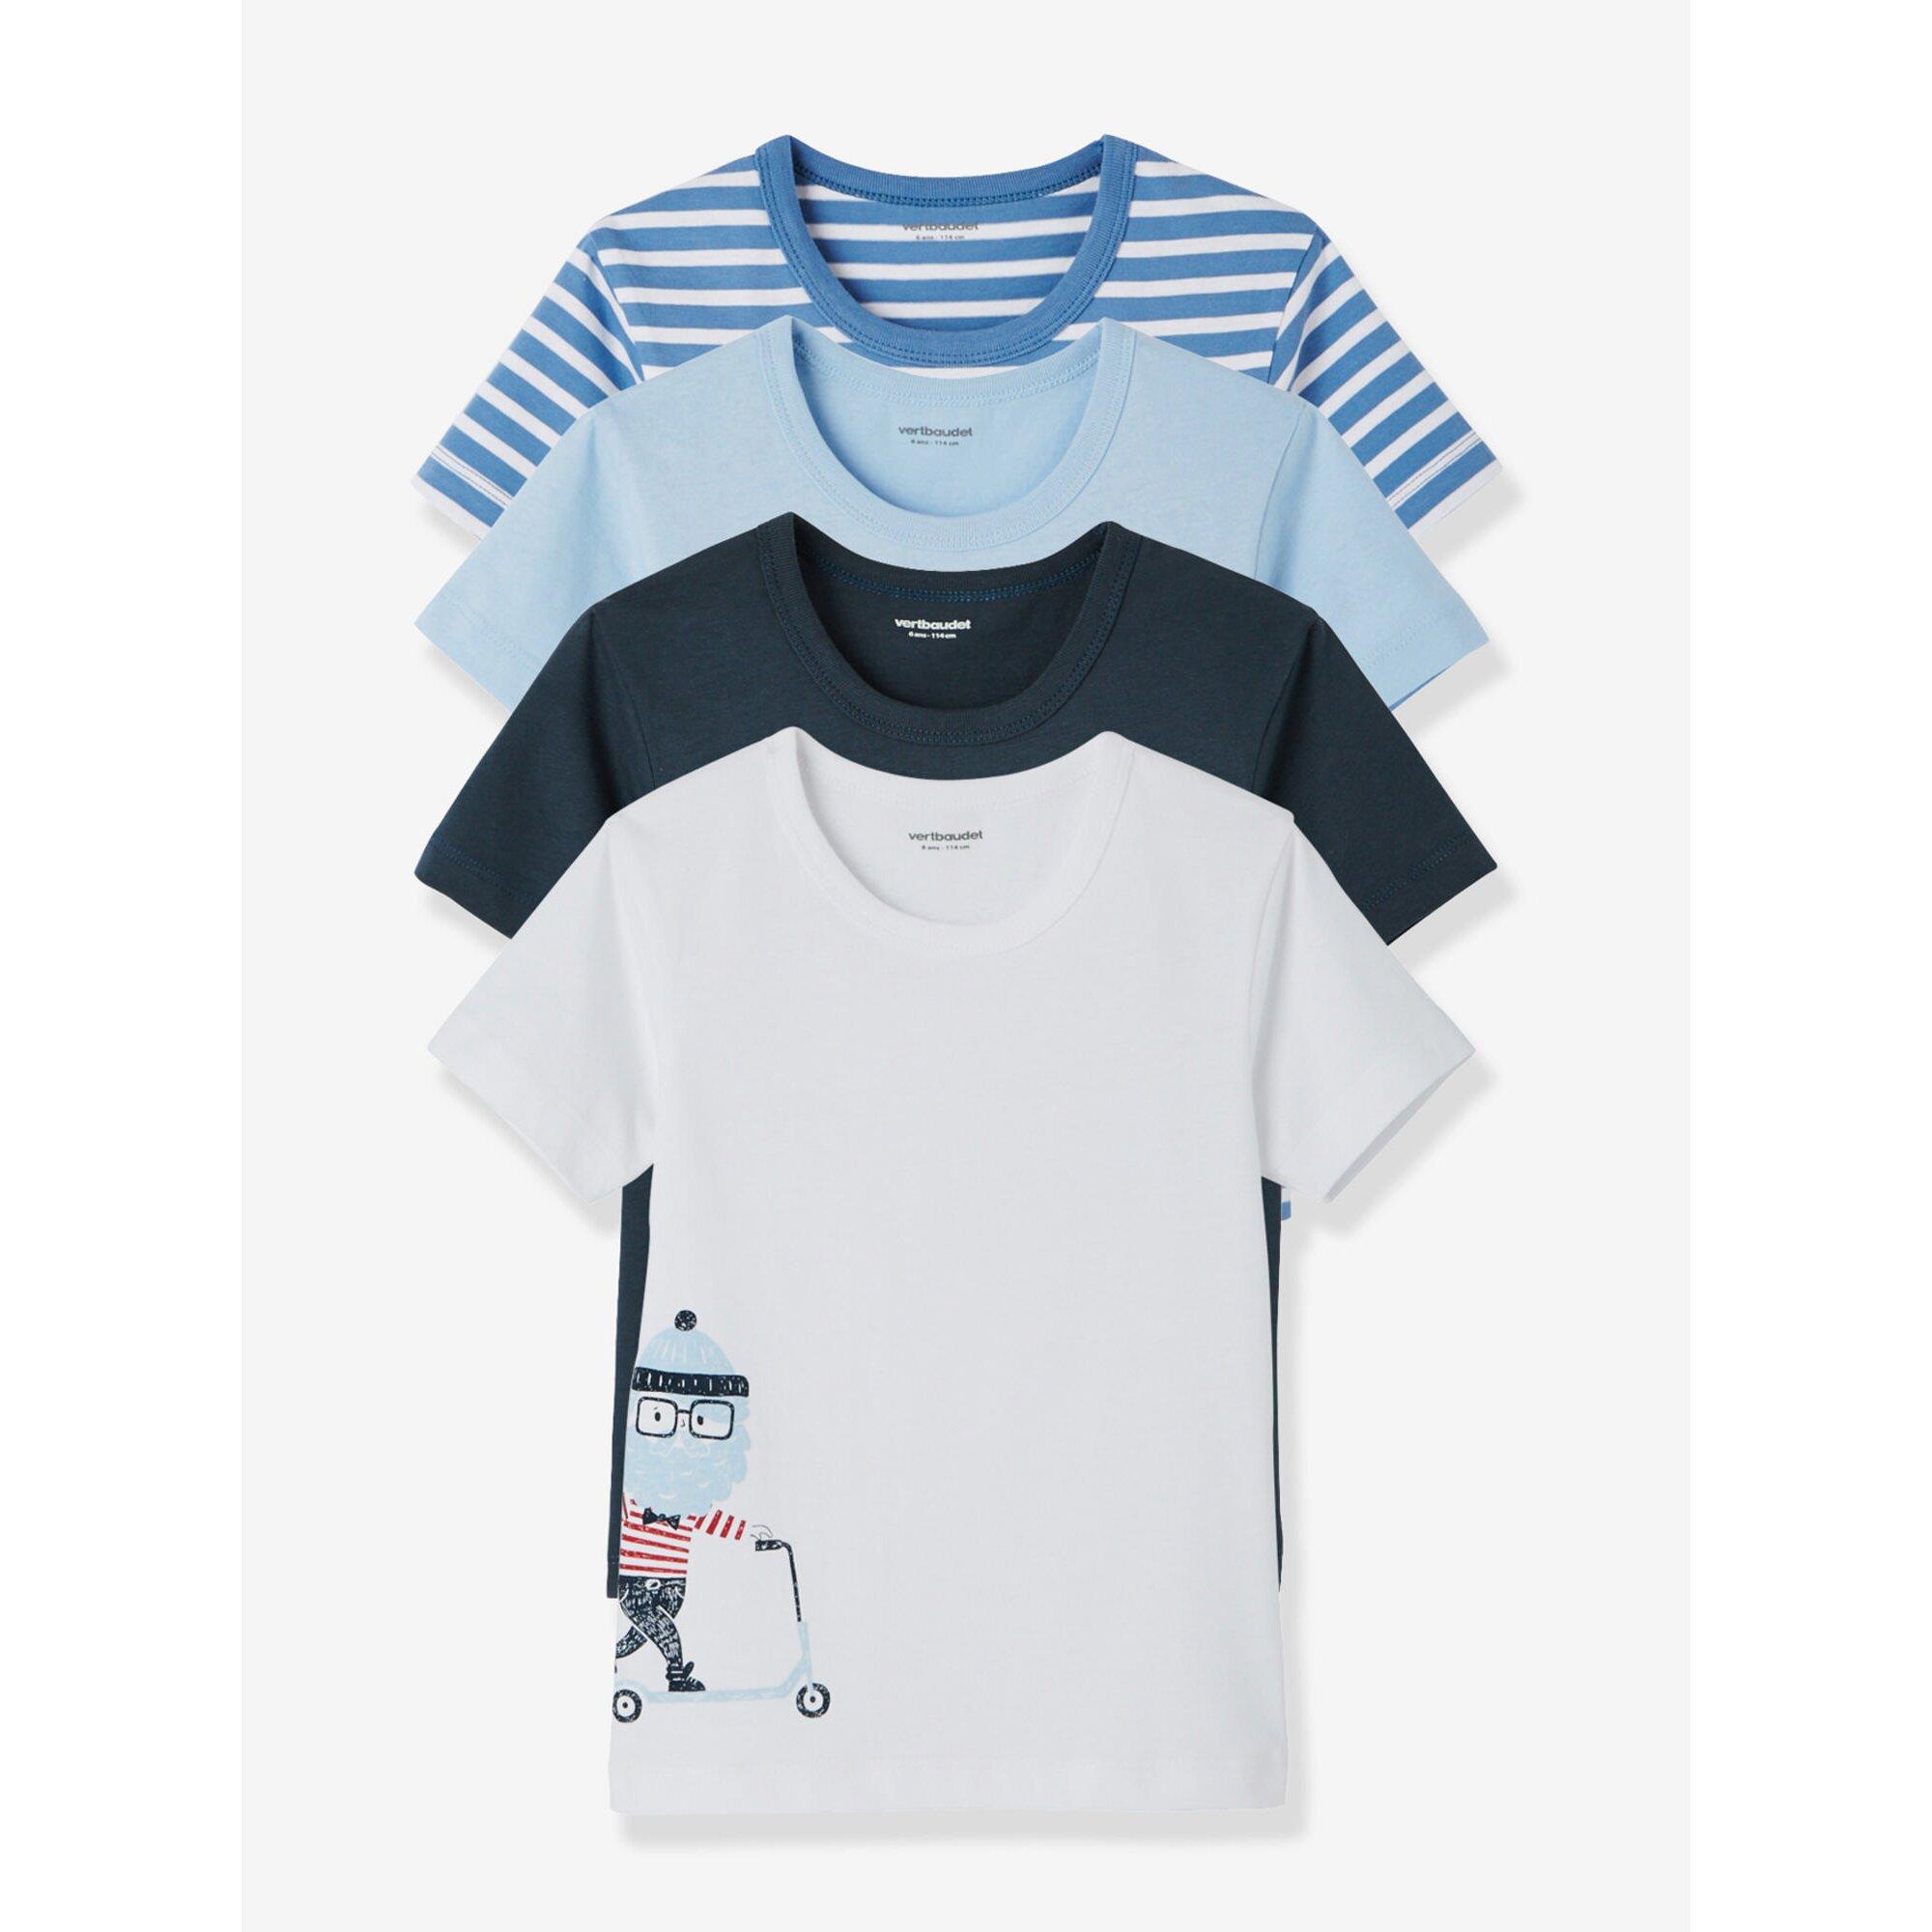 vertbaudet-4er-pack-t-shirts-fur-jungen